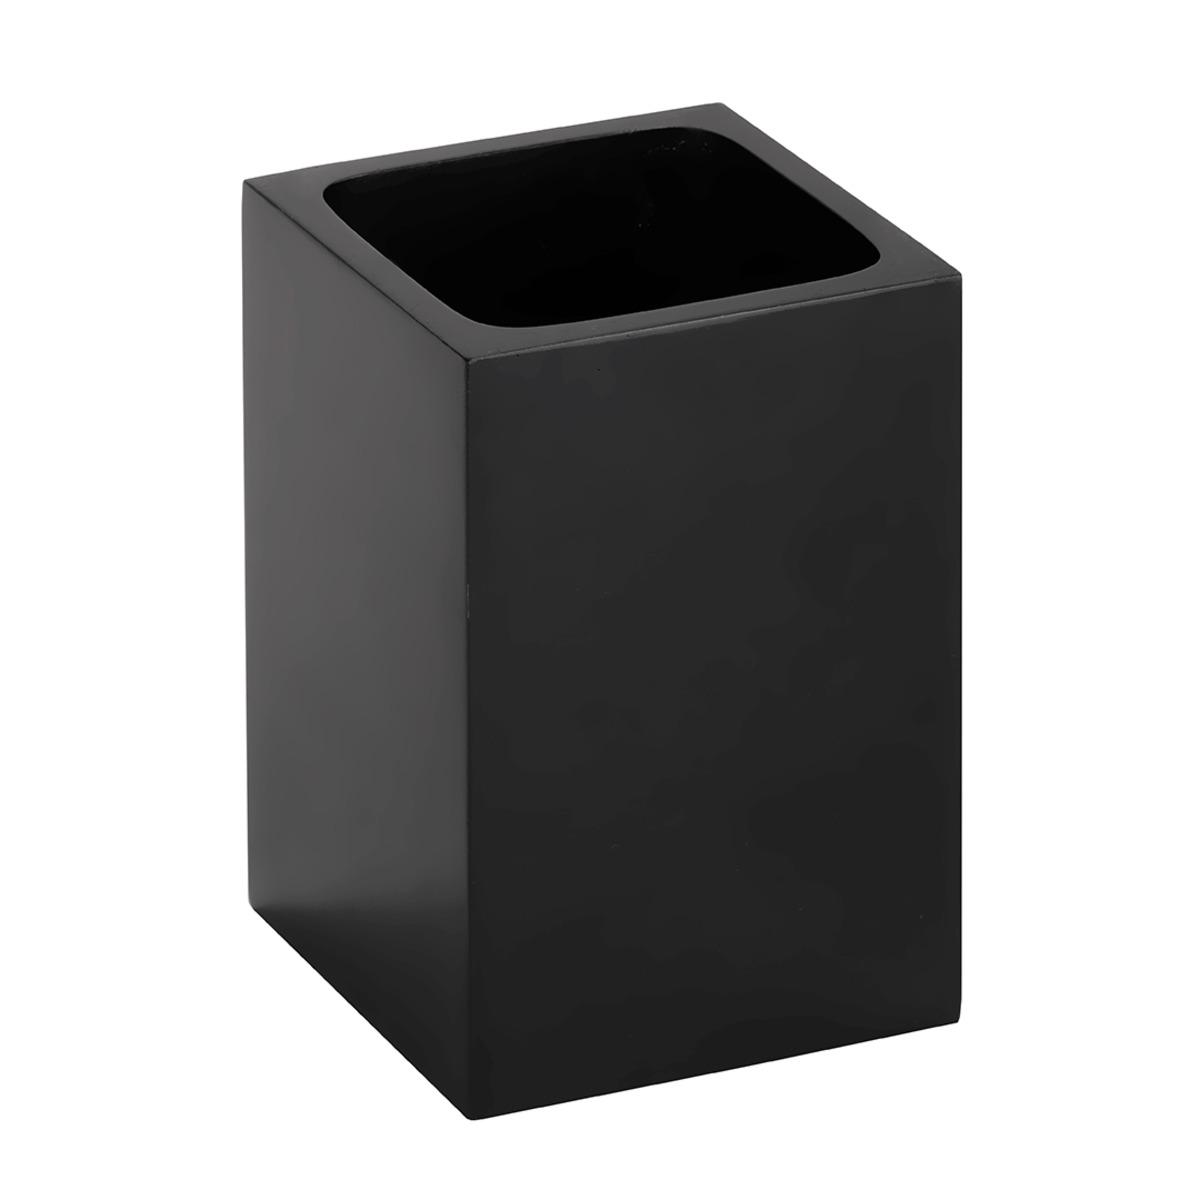 Držák kartáčků Bemeta GAMMA černá 145611310